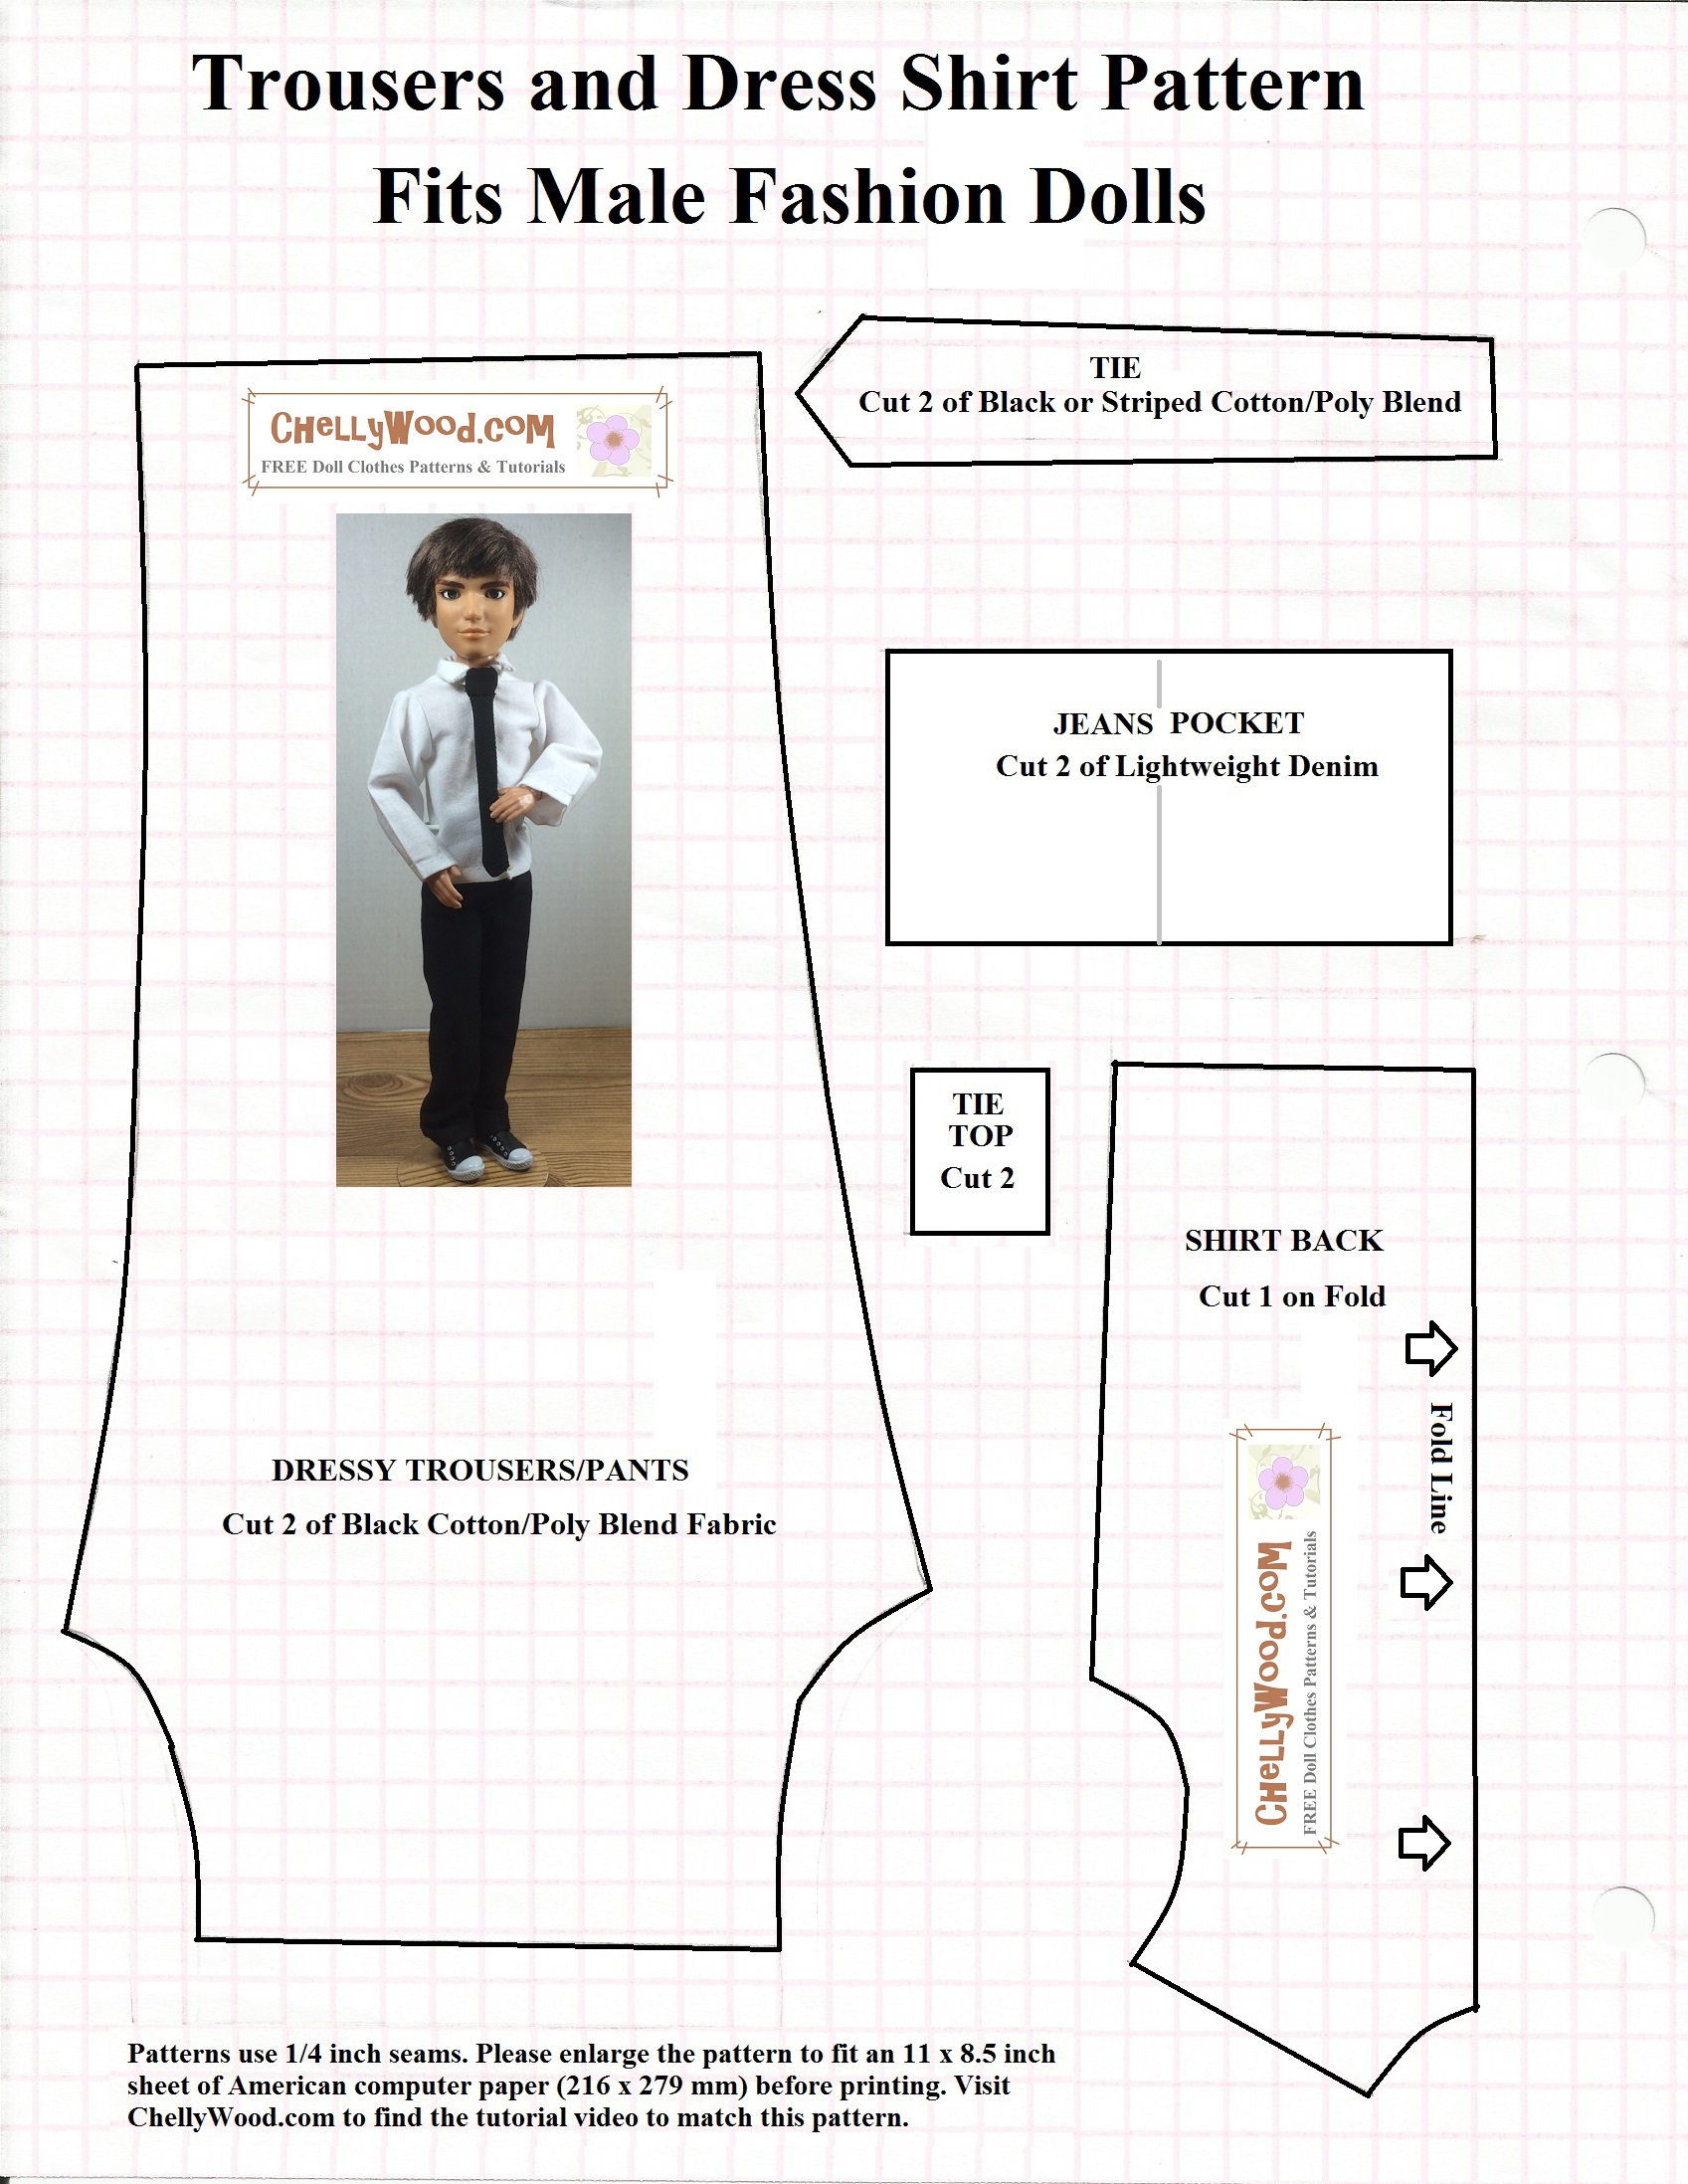 Free Printable #sewing Patterns For Ken #dolls' #clothes - Free Printable Patterns For Sewing Doll Clothes